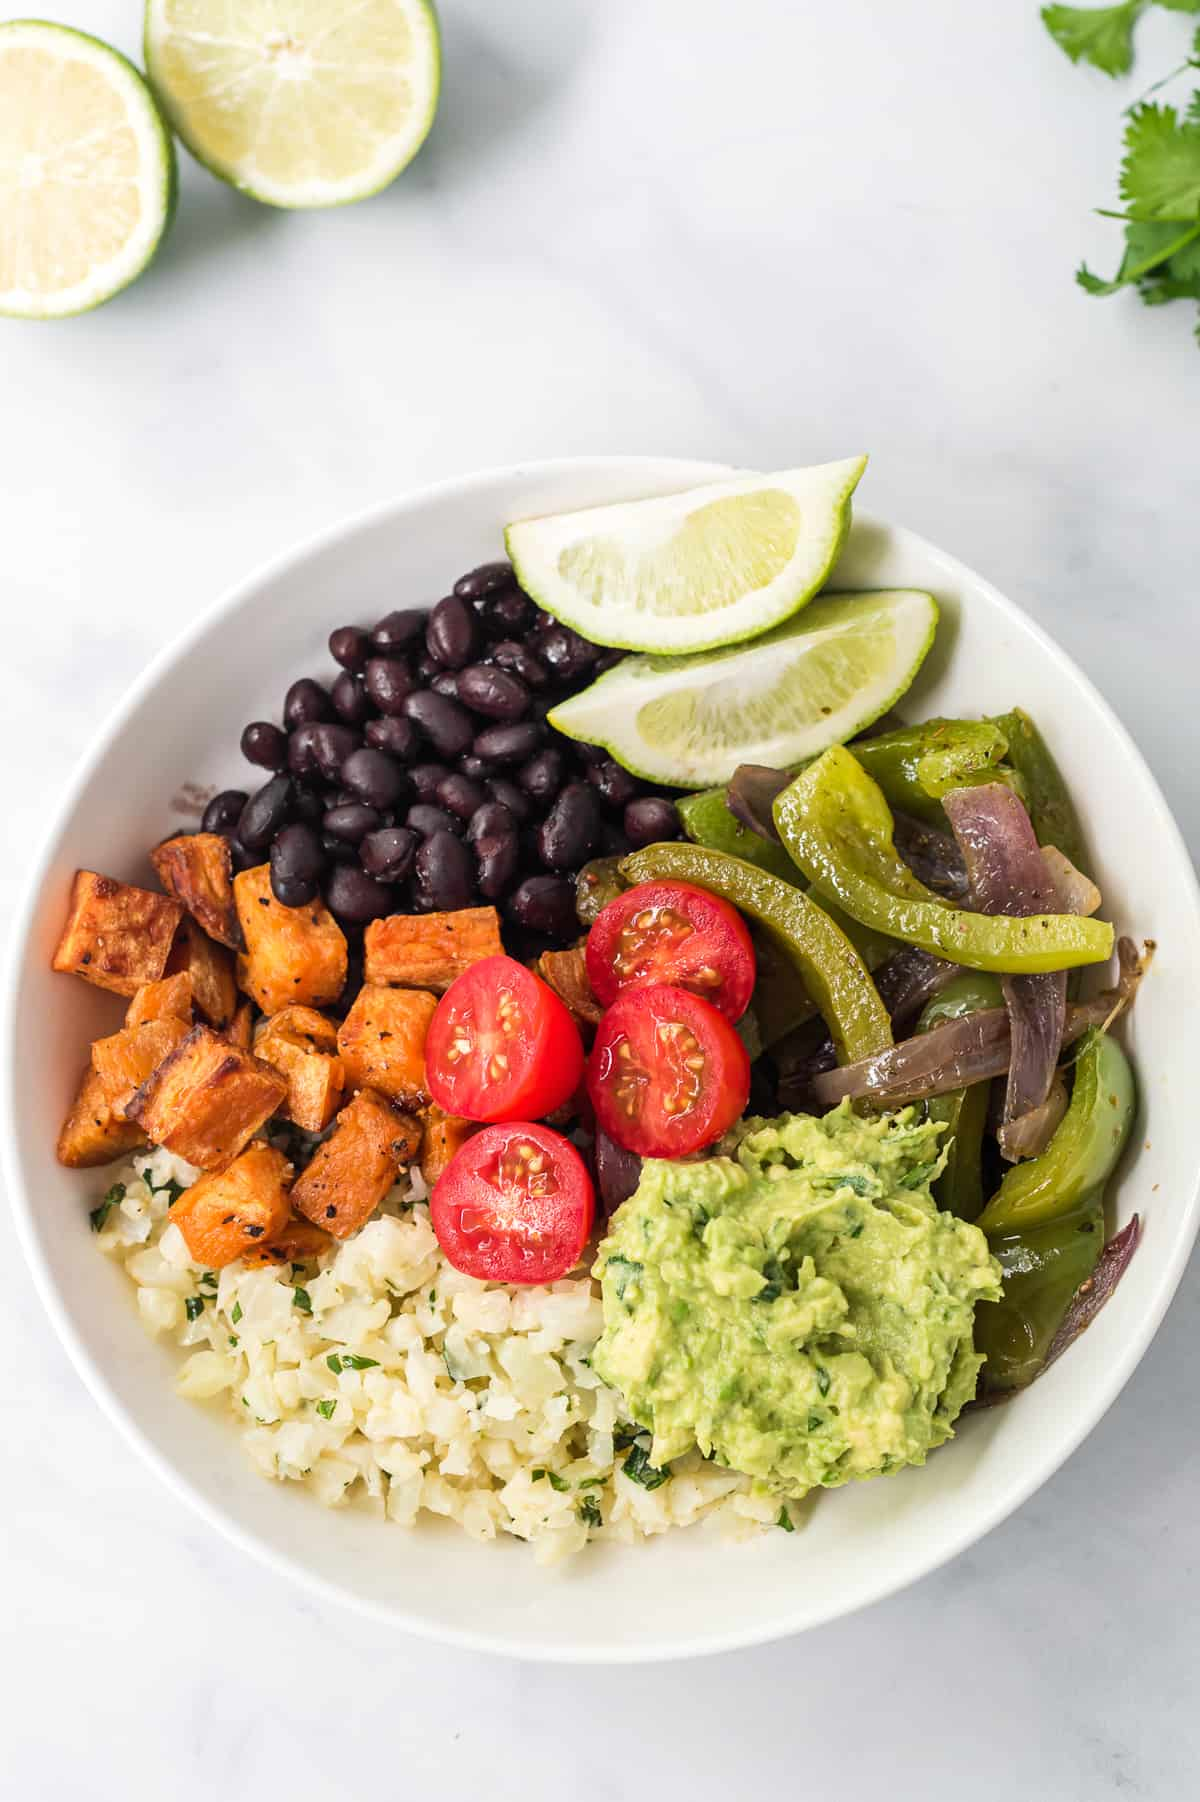 burrito bowl with sweet potatoes, black beans, tomatoes, guacamole, fajita veggies, and lime wedges